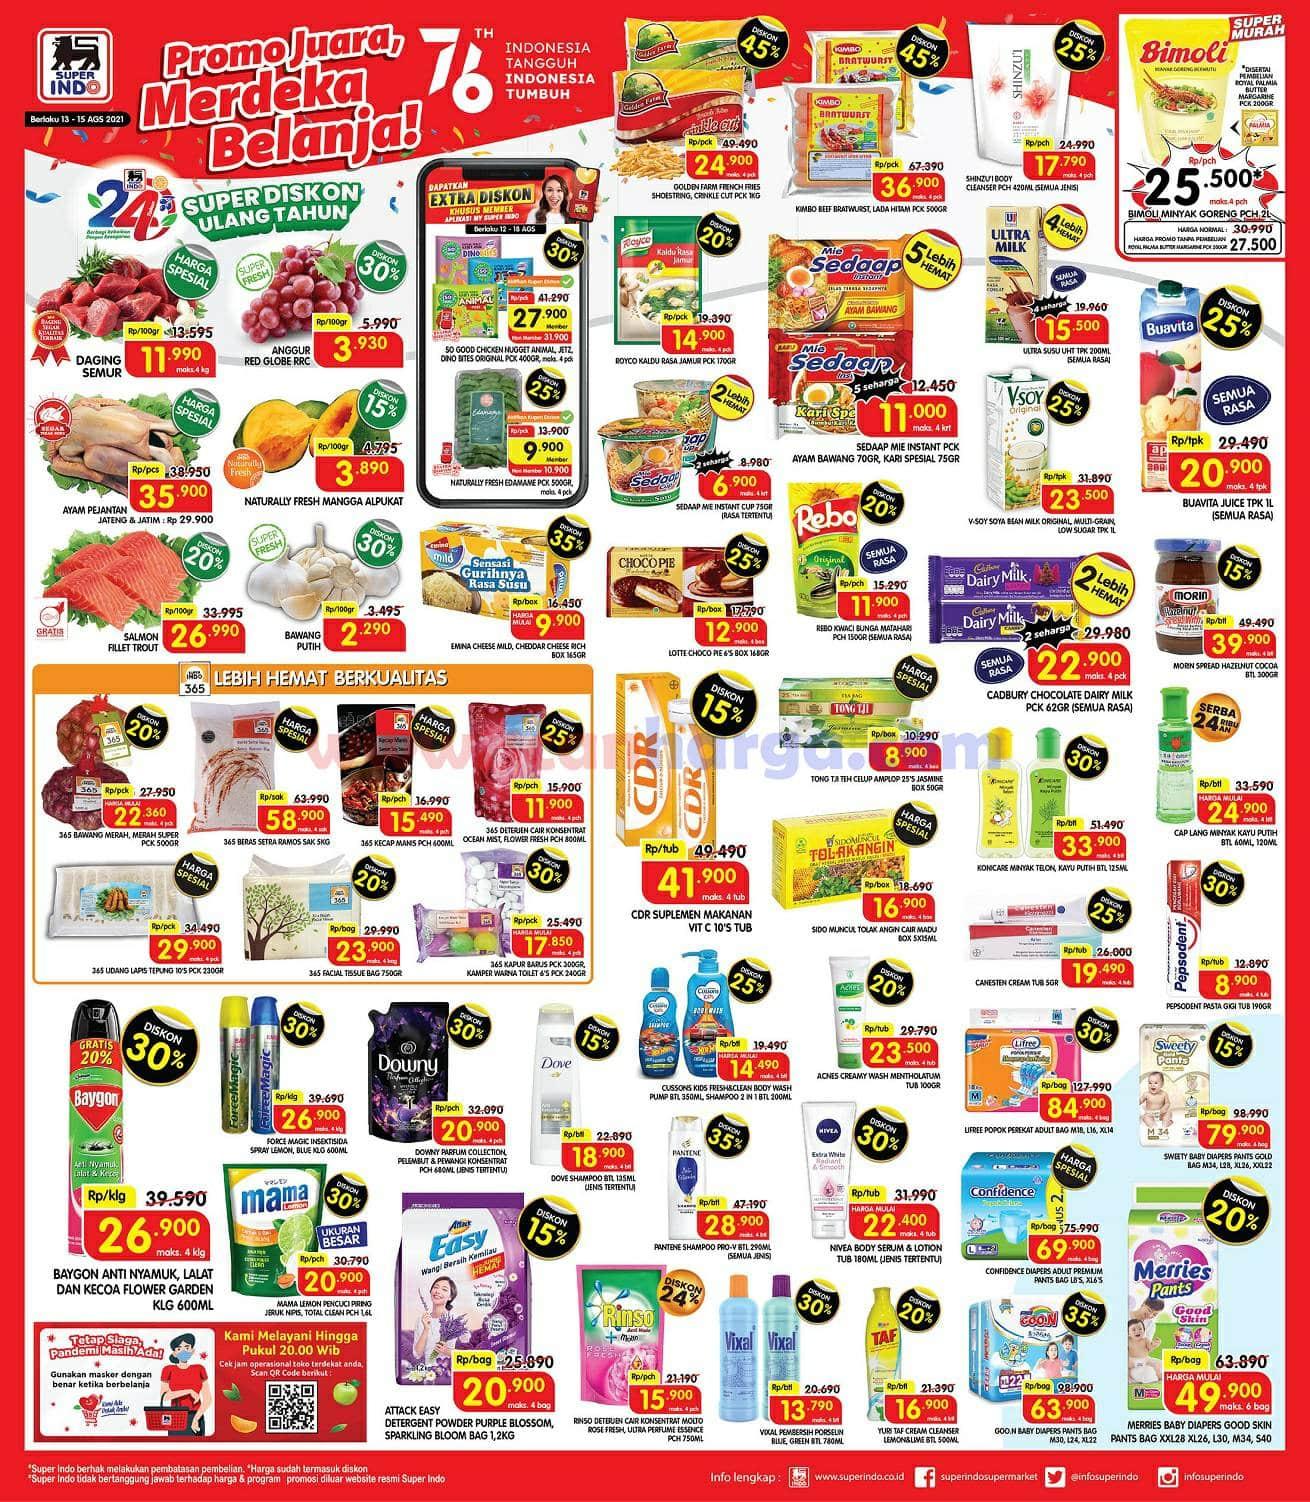 Katalog Promo Superindo Weekend Terbaru 13 - 15 Agustus 2021